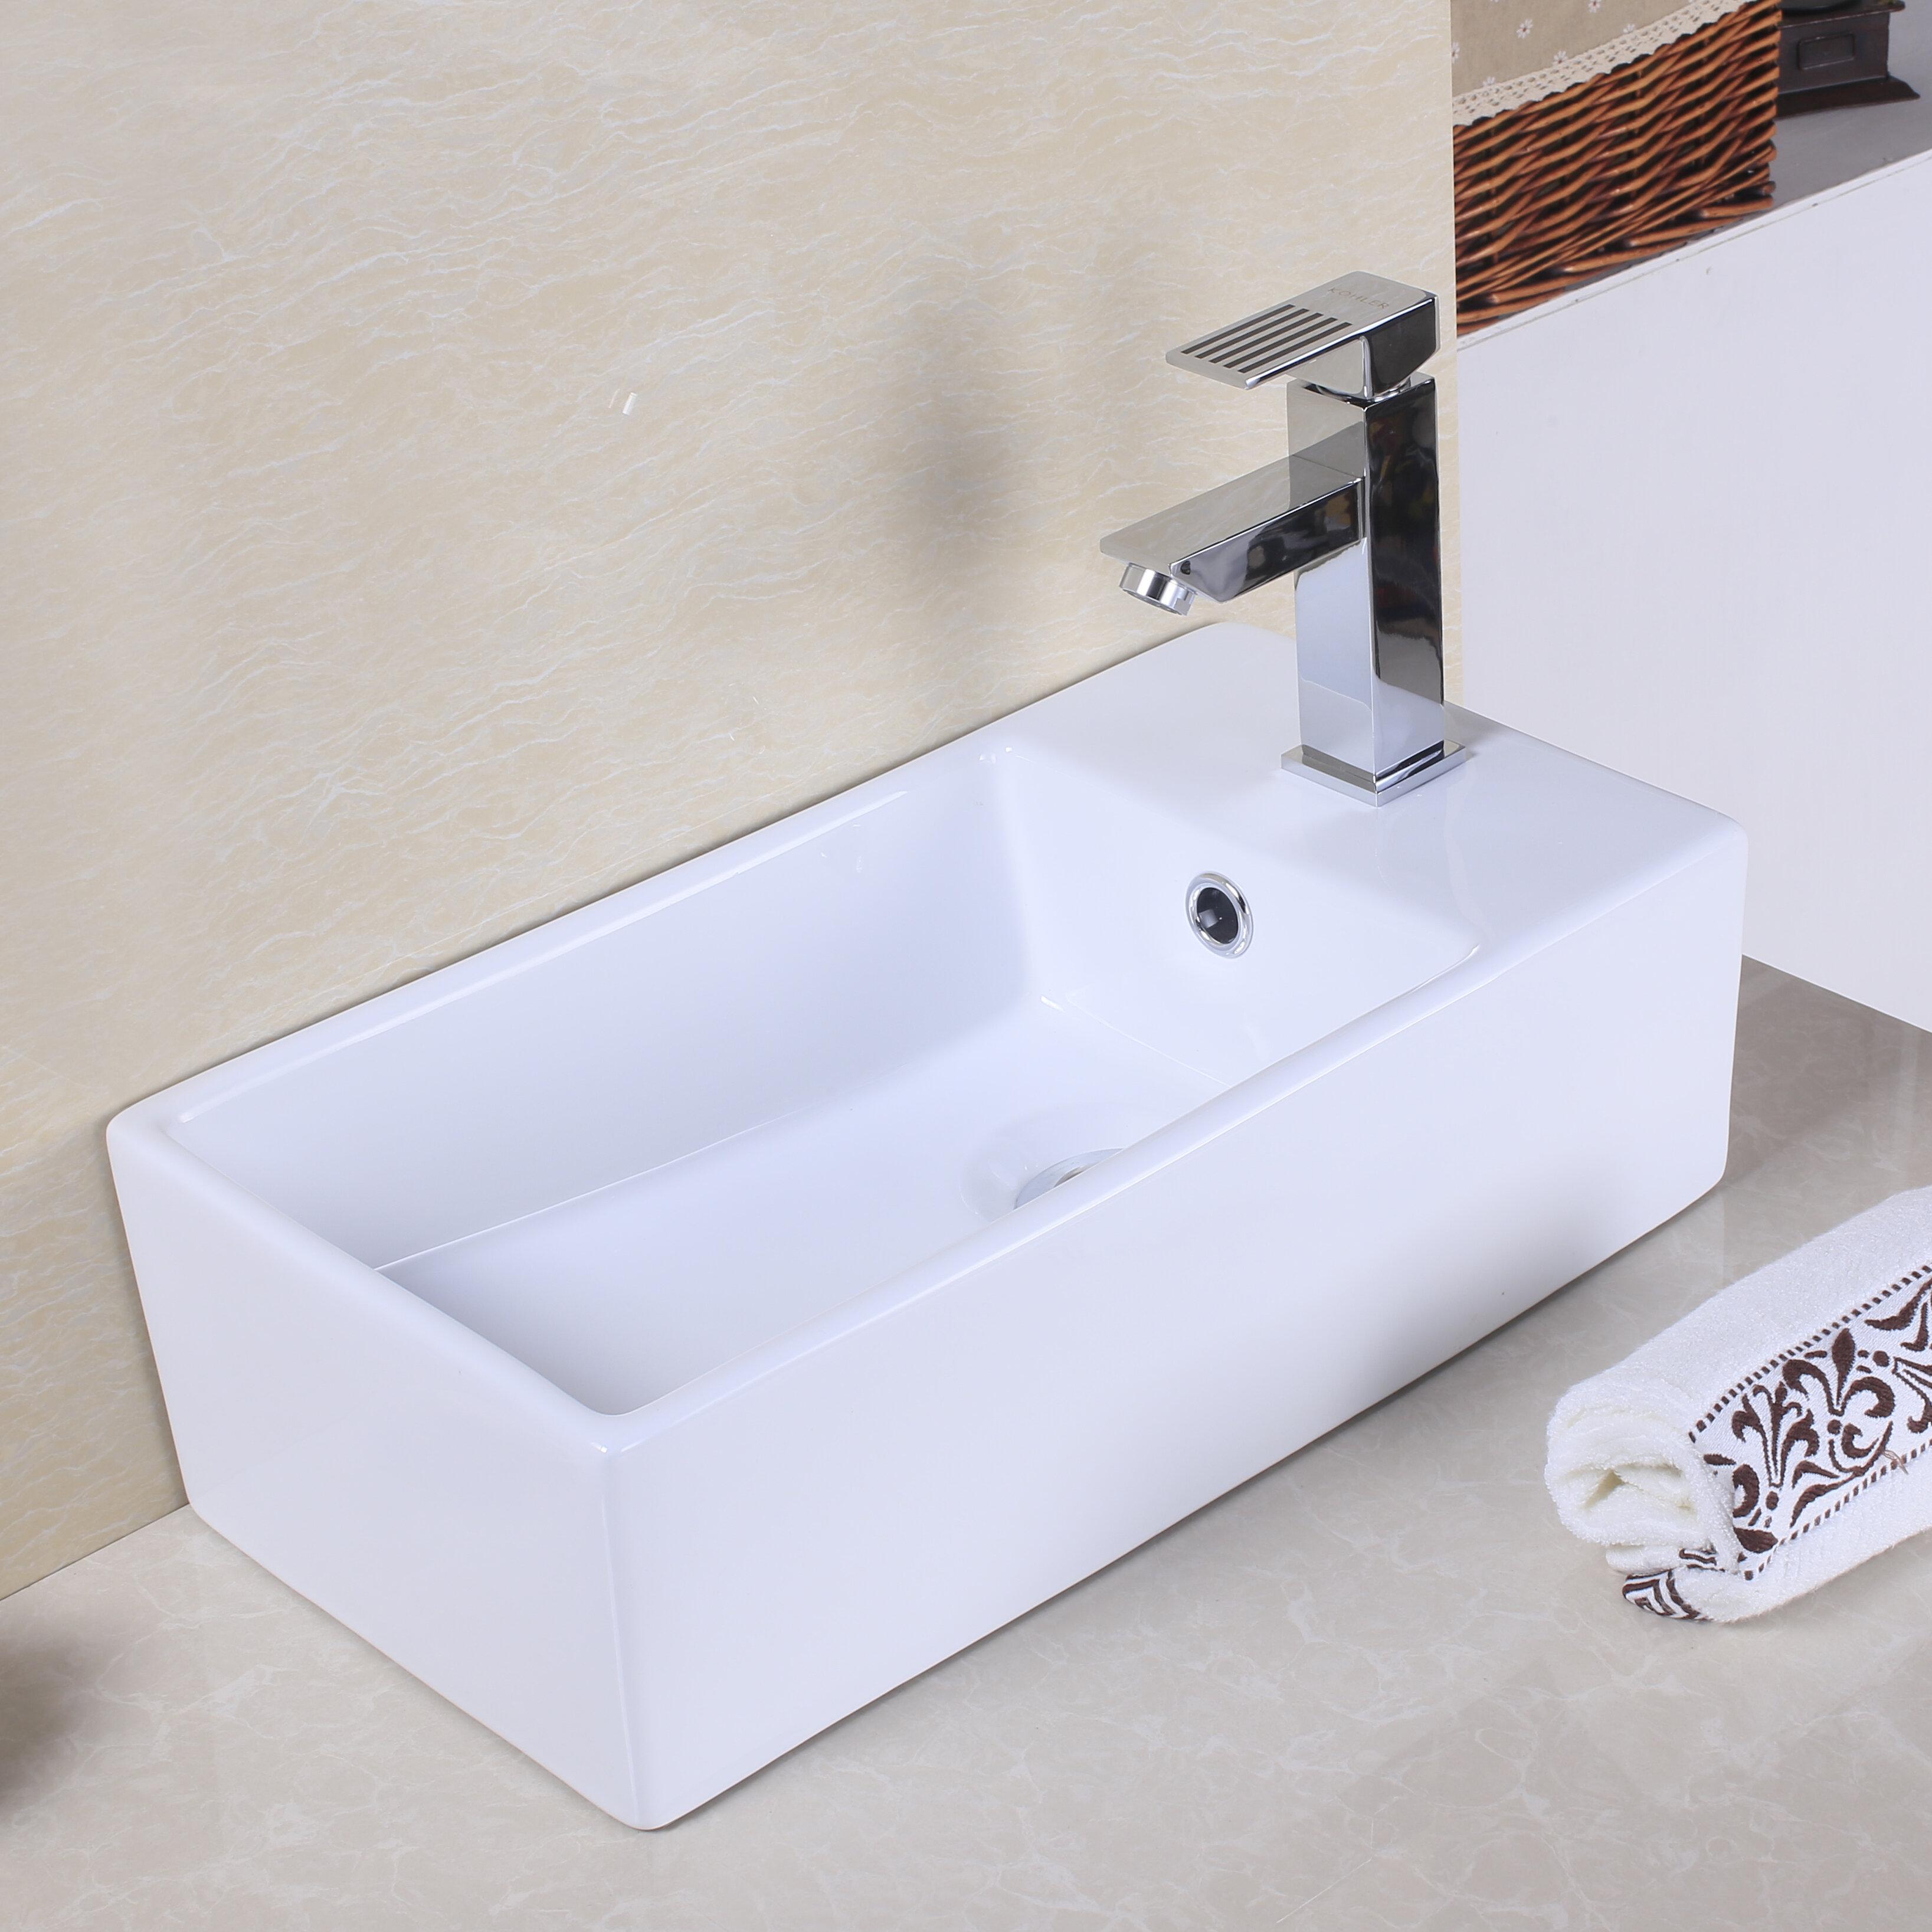 American Imaginations Ceramic Rectangular Vessel Bathroom Sink With Overflow Reviews Wayfair